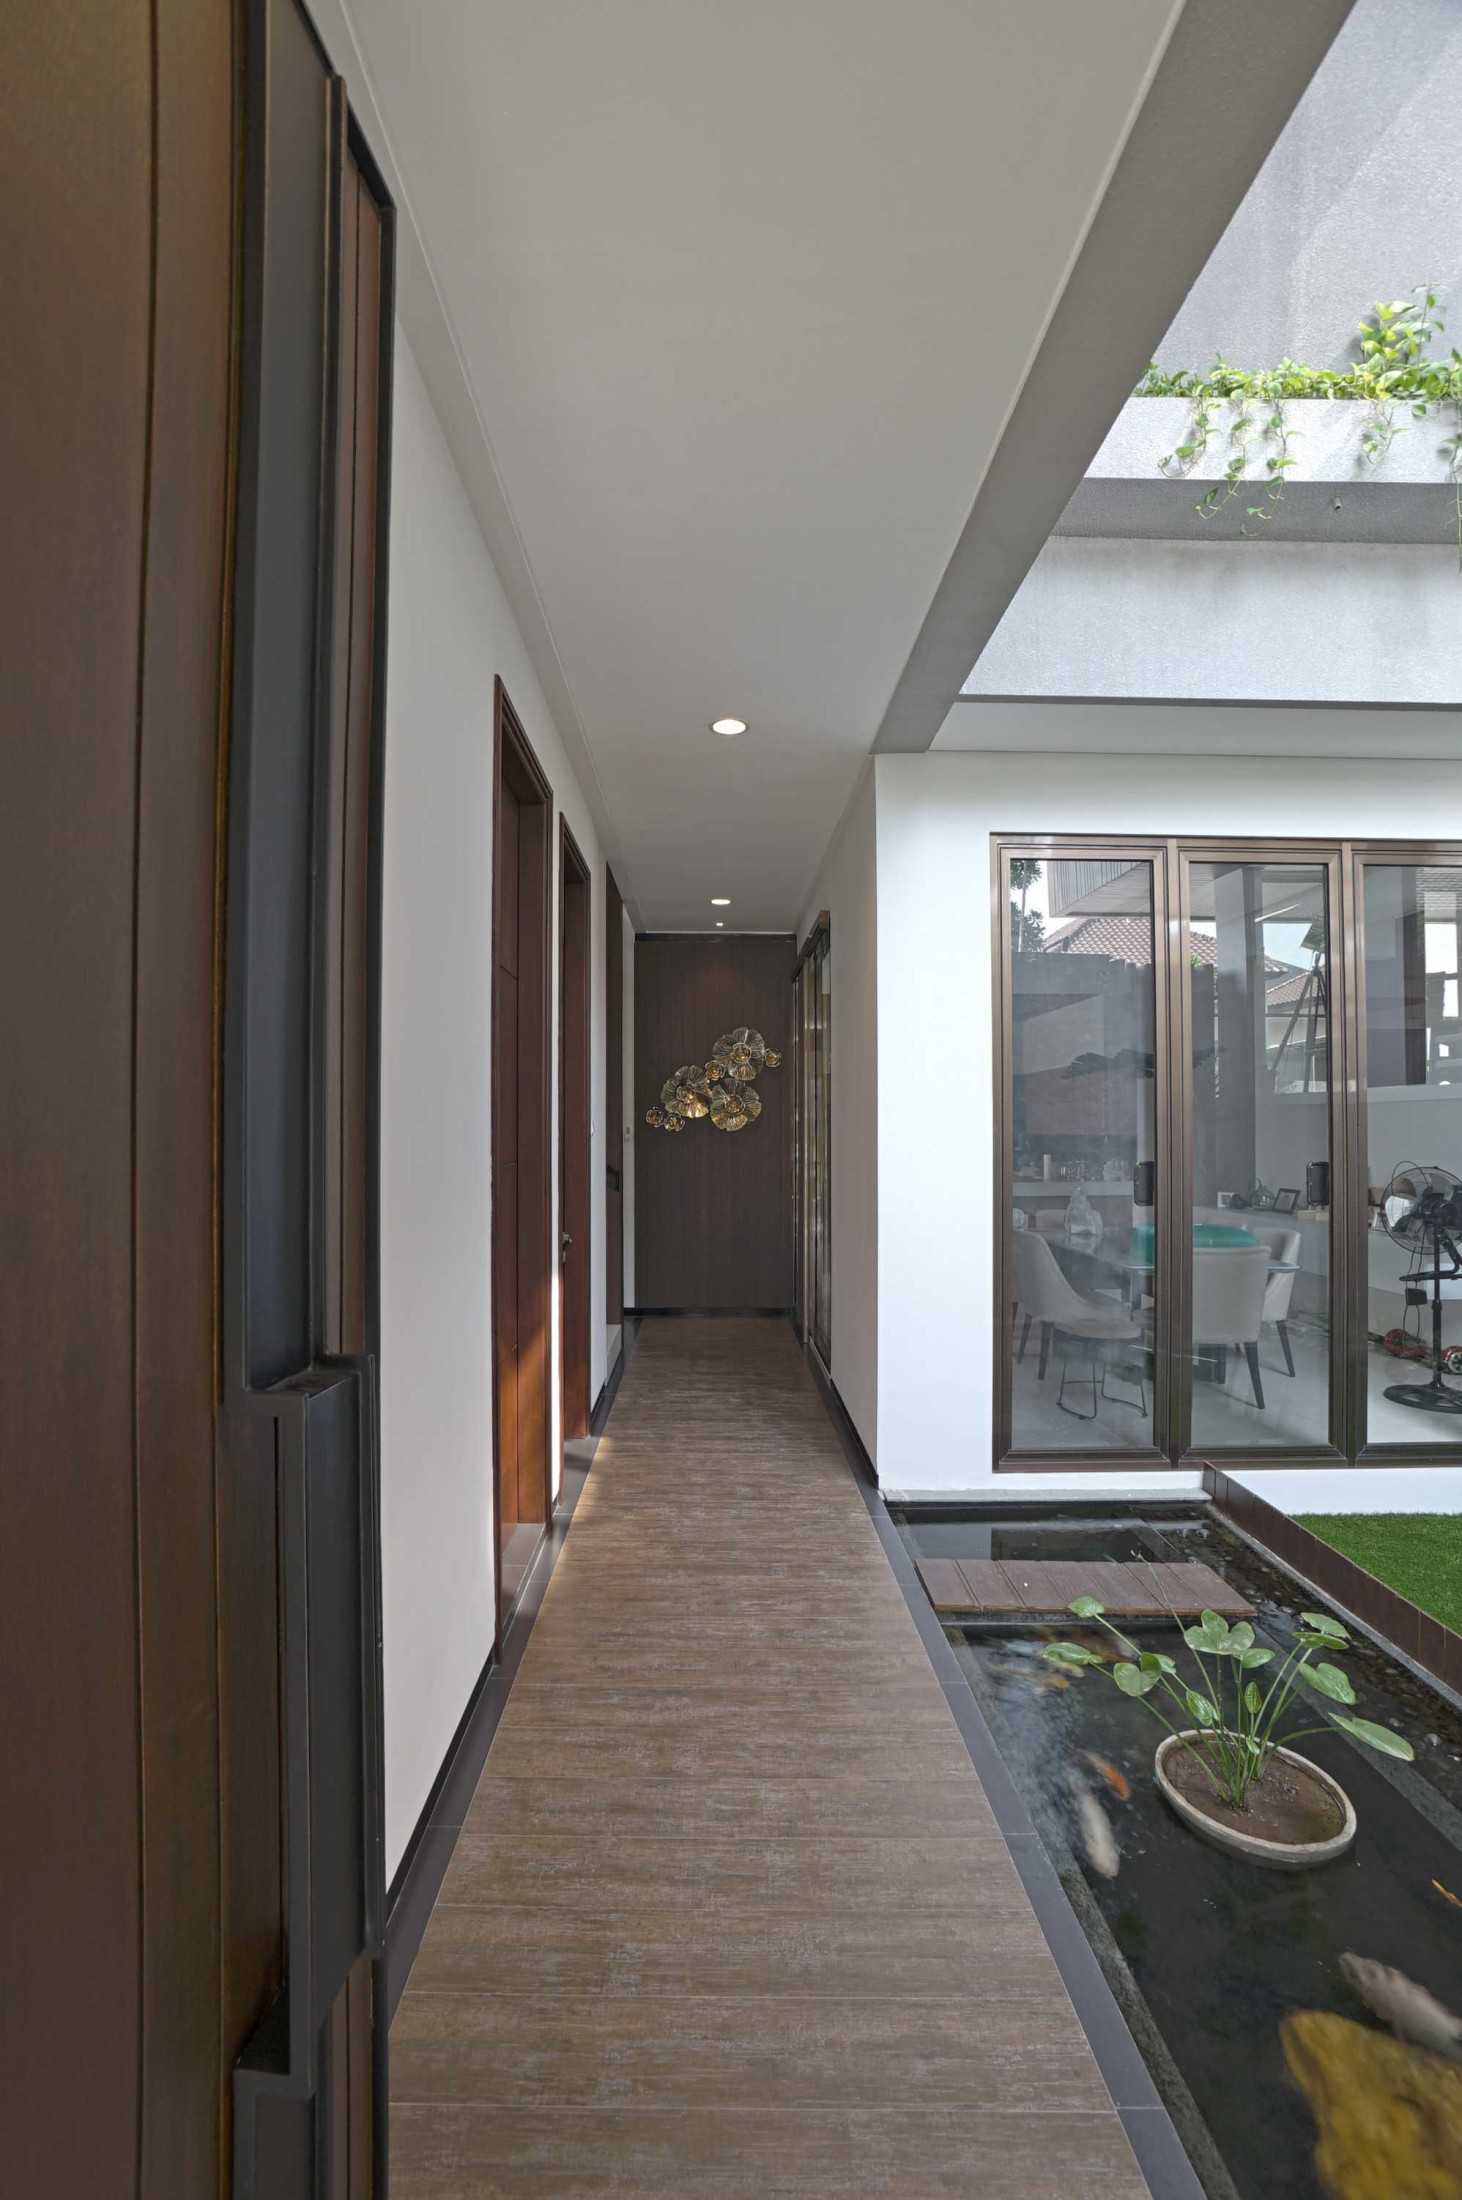 Rendic Ho Dw House Surabaya, Kota Sby, Jawa Timur, Indonesia Surabaya, Kota Sby, Jawa Timur, Indonesia Rendic-Ho-Dw-House  107064